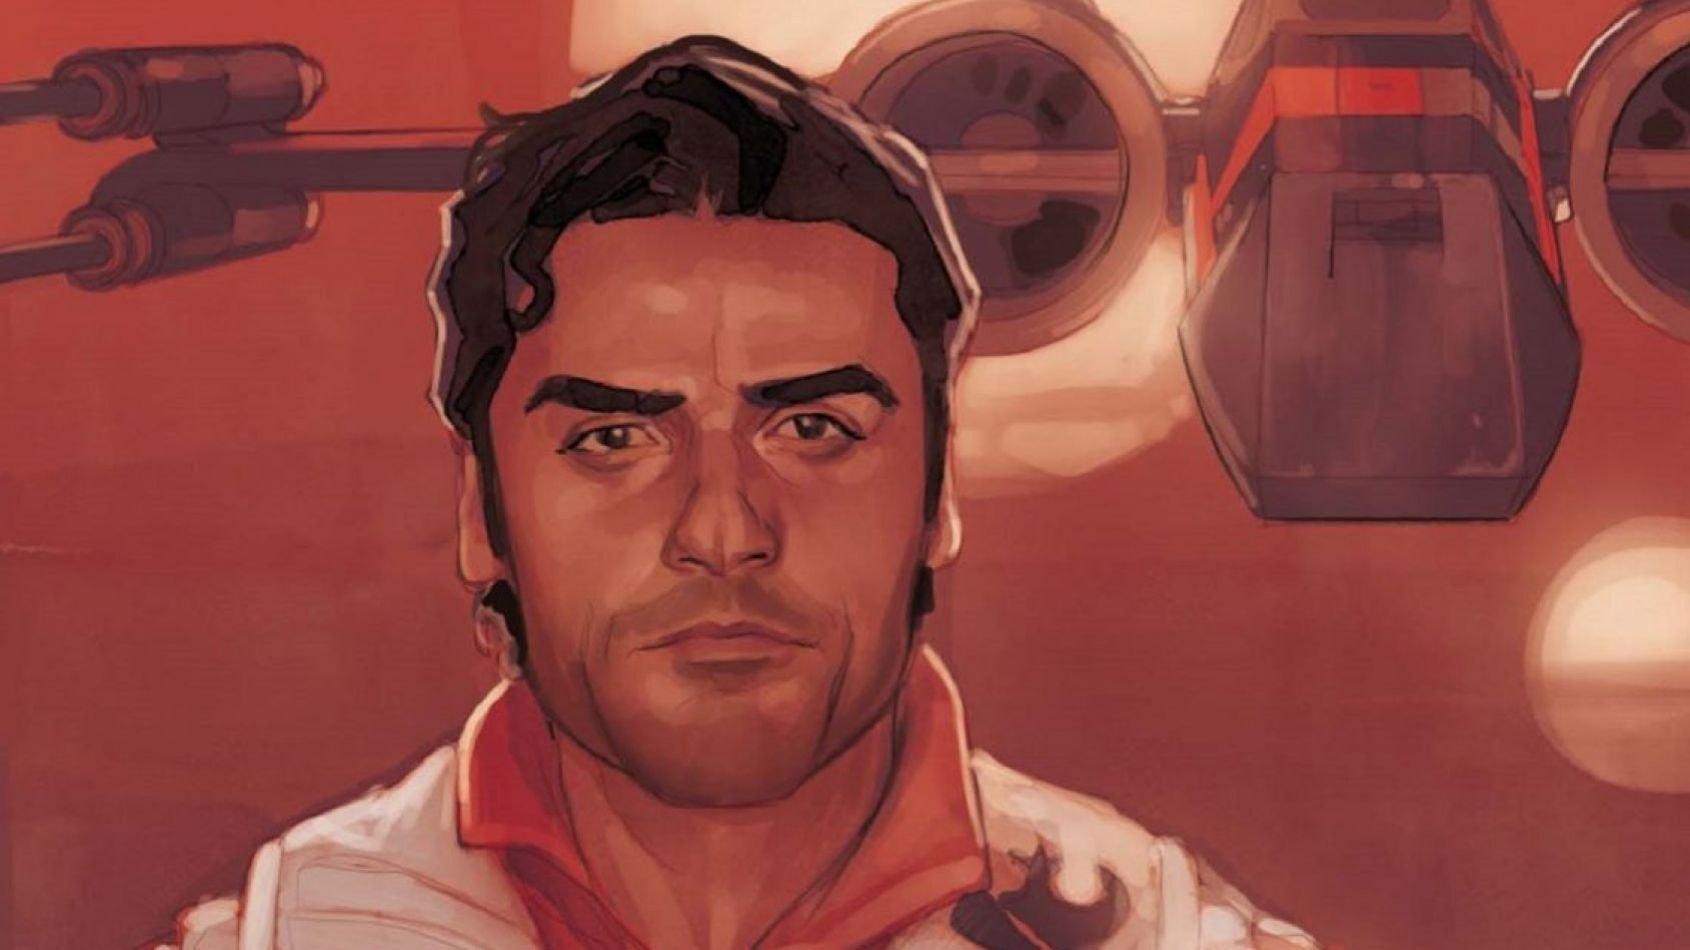 Panini : Poe Dameron 4 et le magazine Star Wars 6